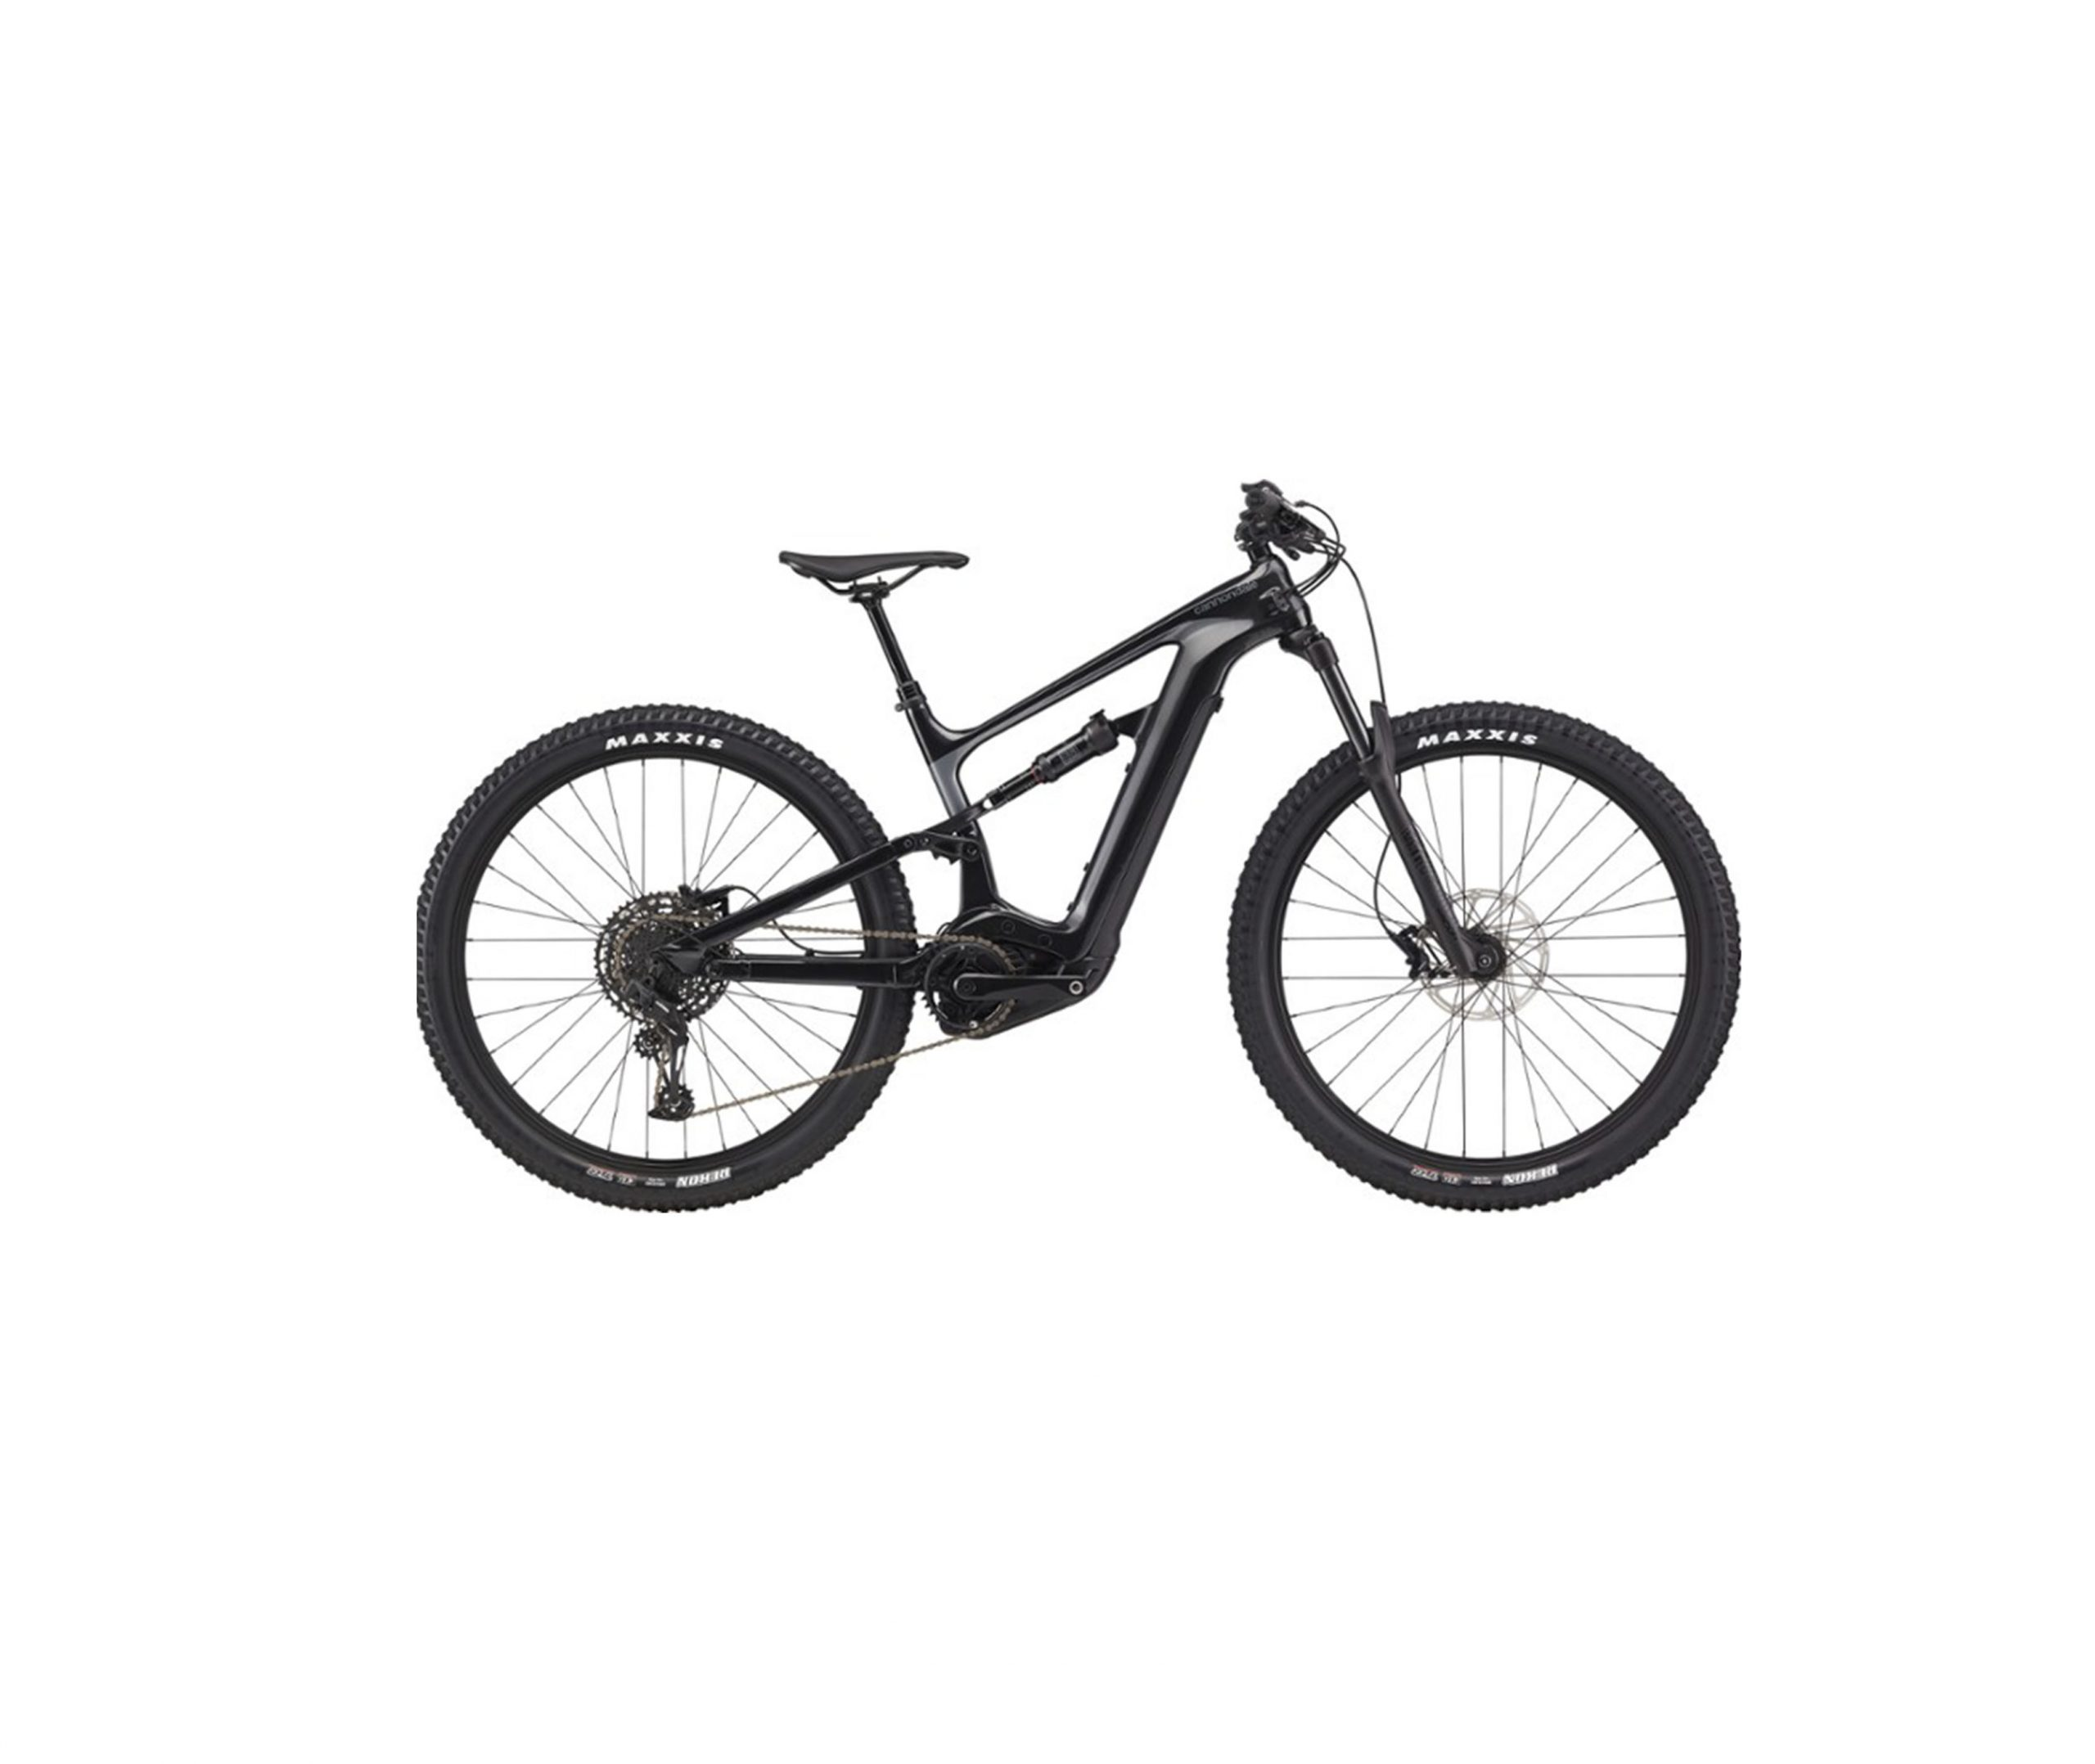 Cannondale Habit Neo Bike